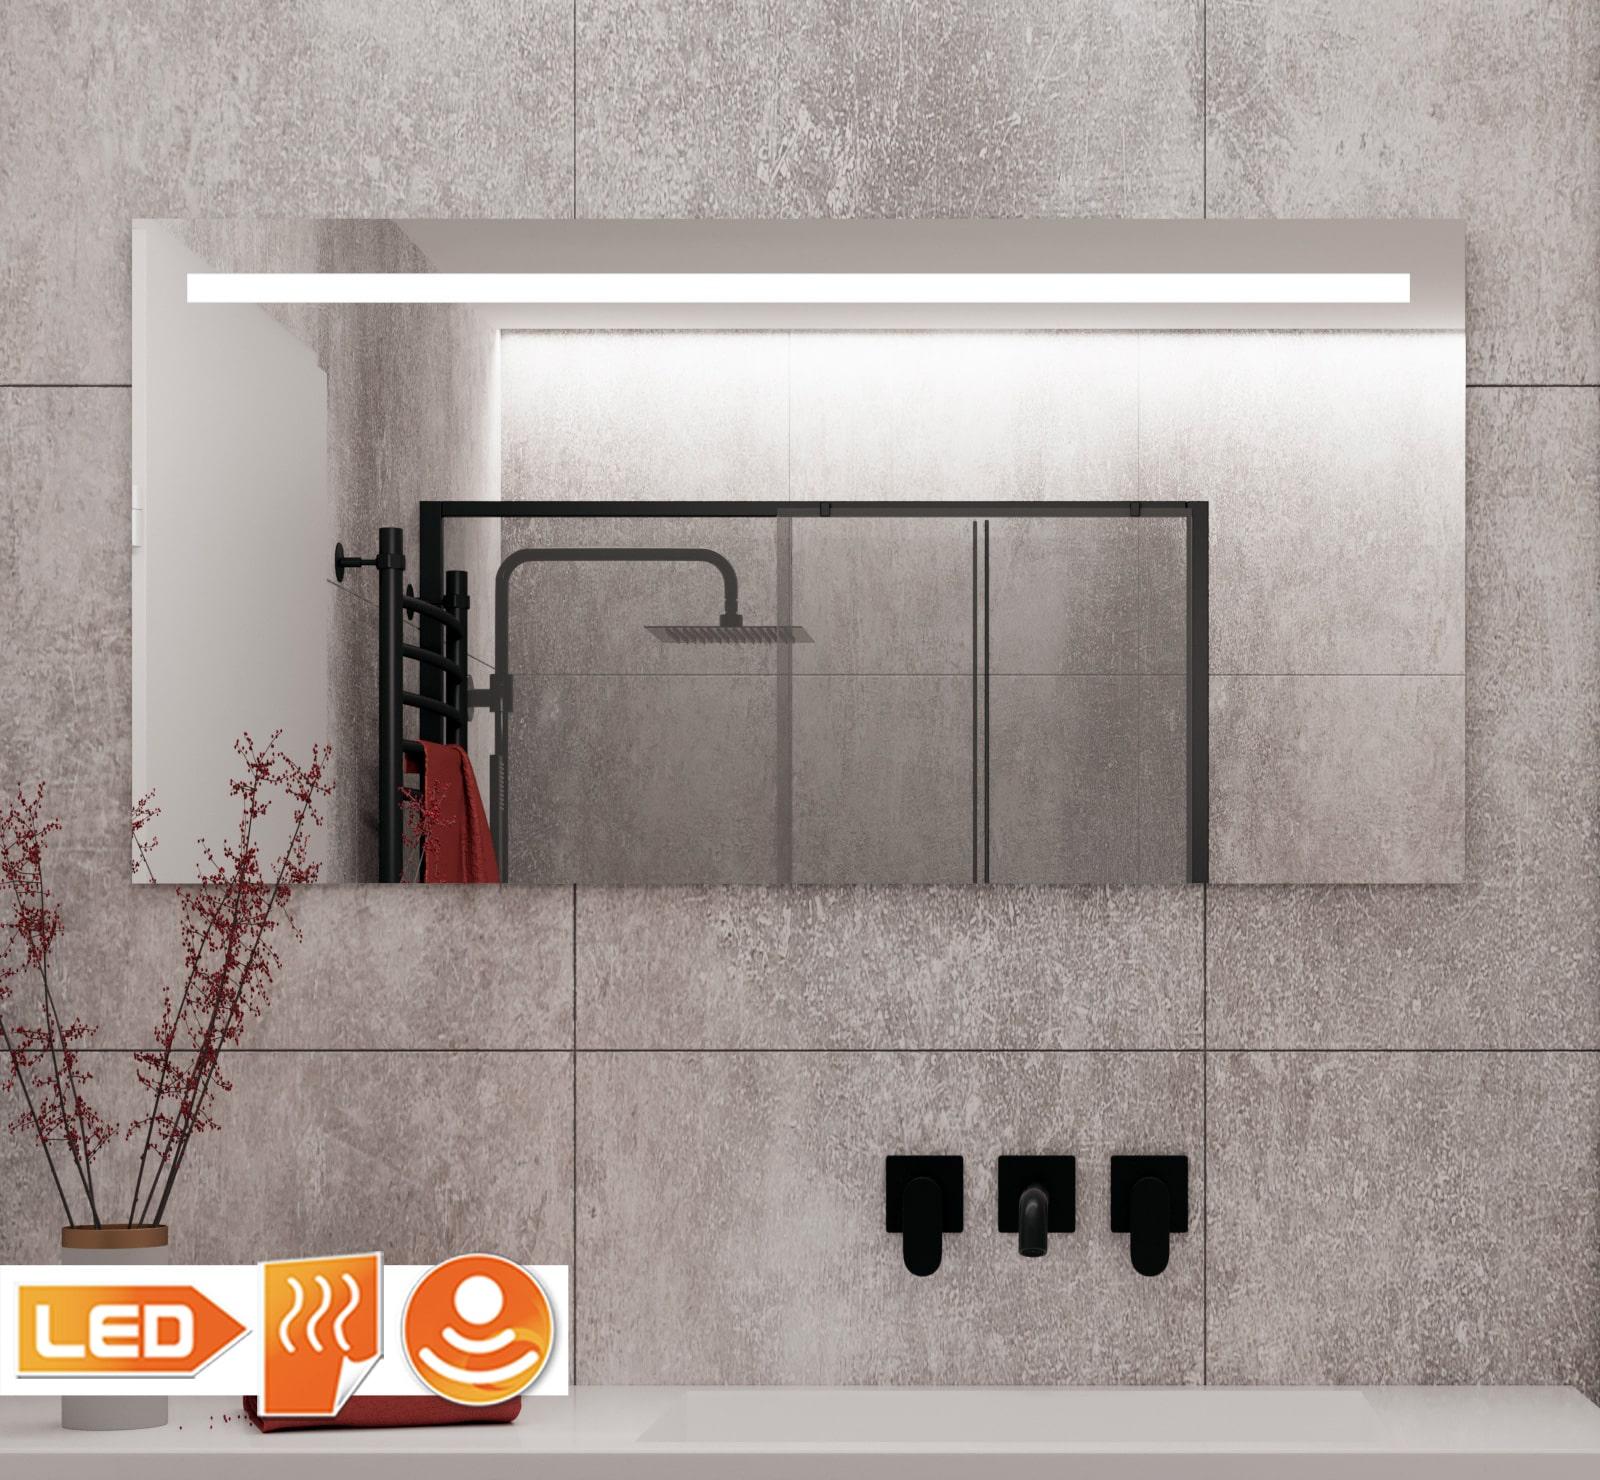 Grote badkamer spiegel met led verlichting